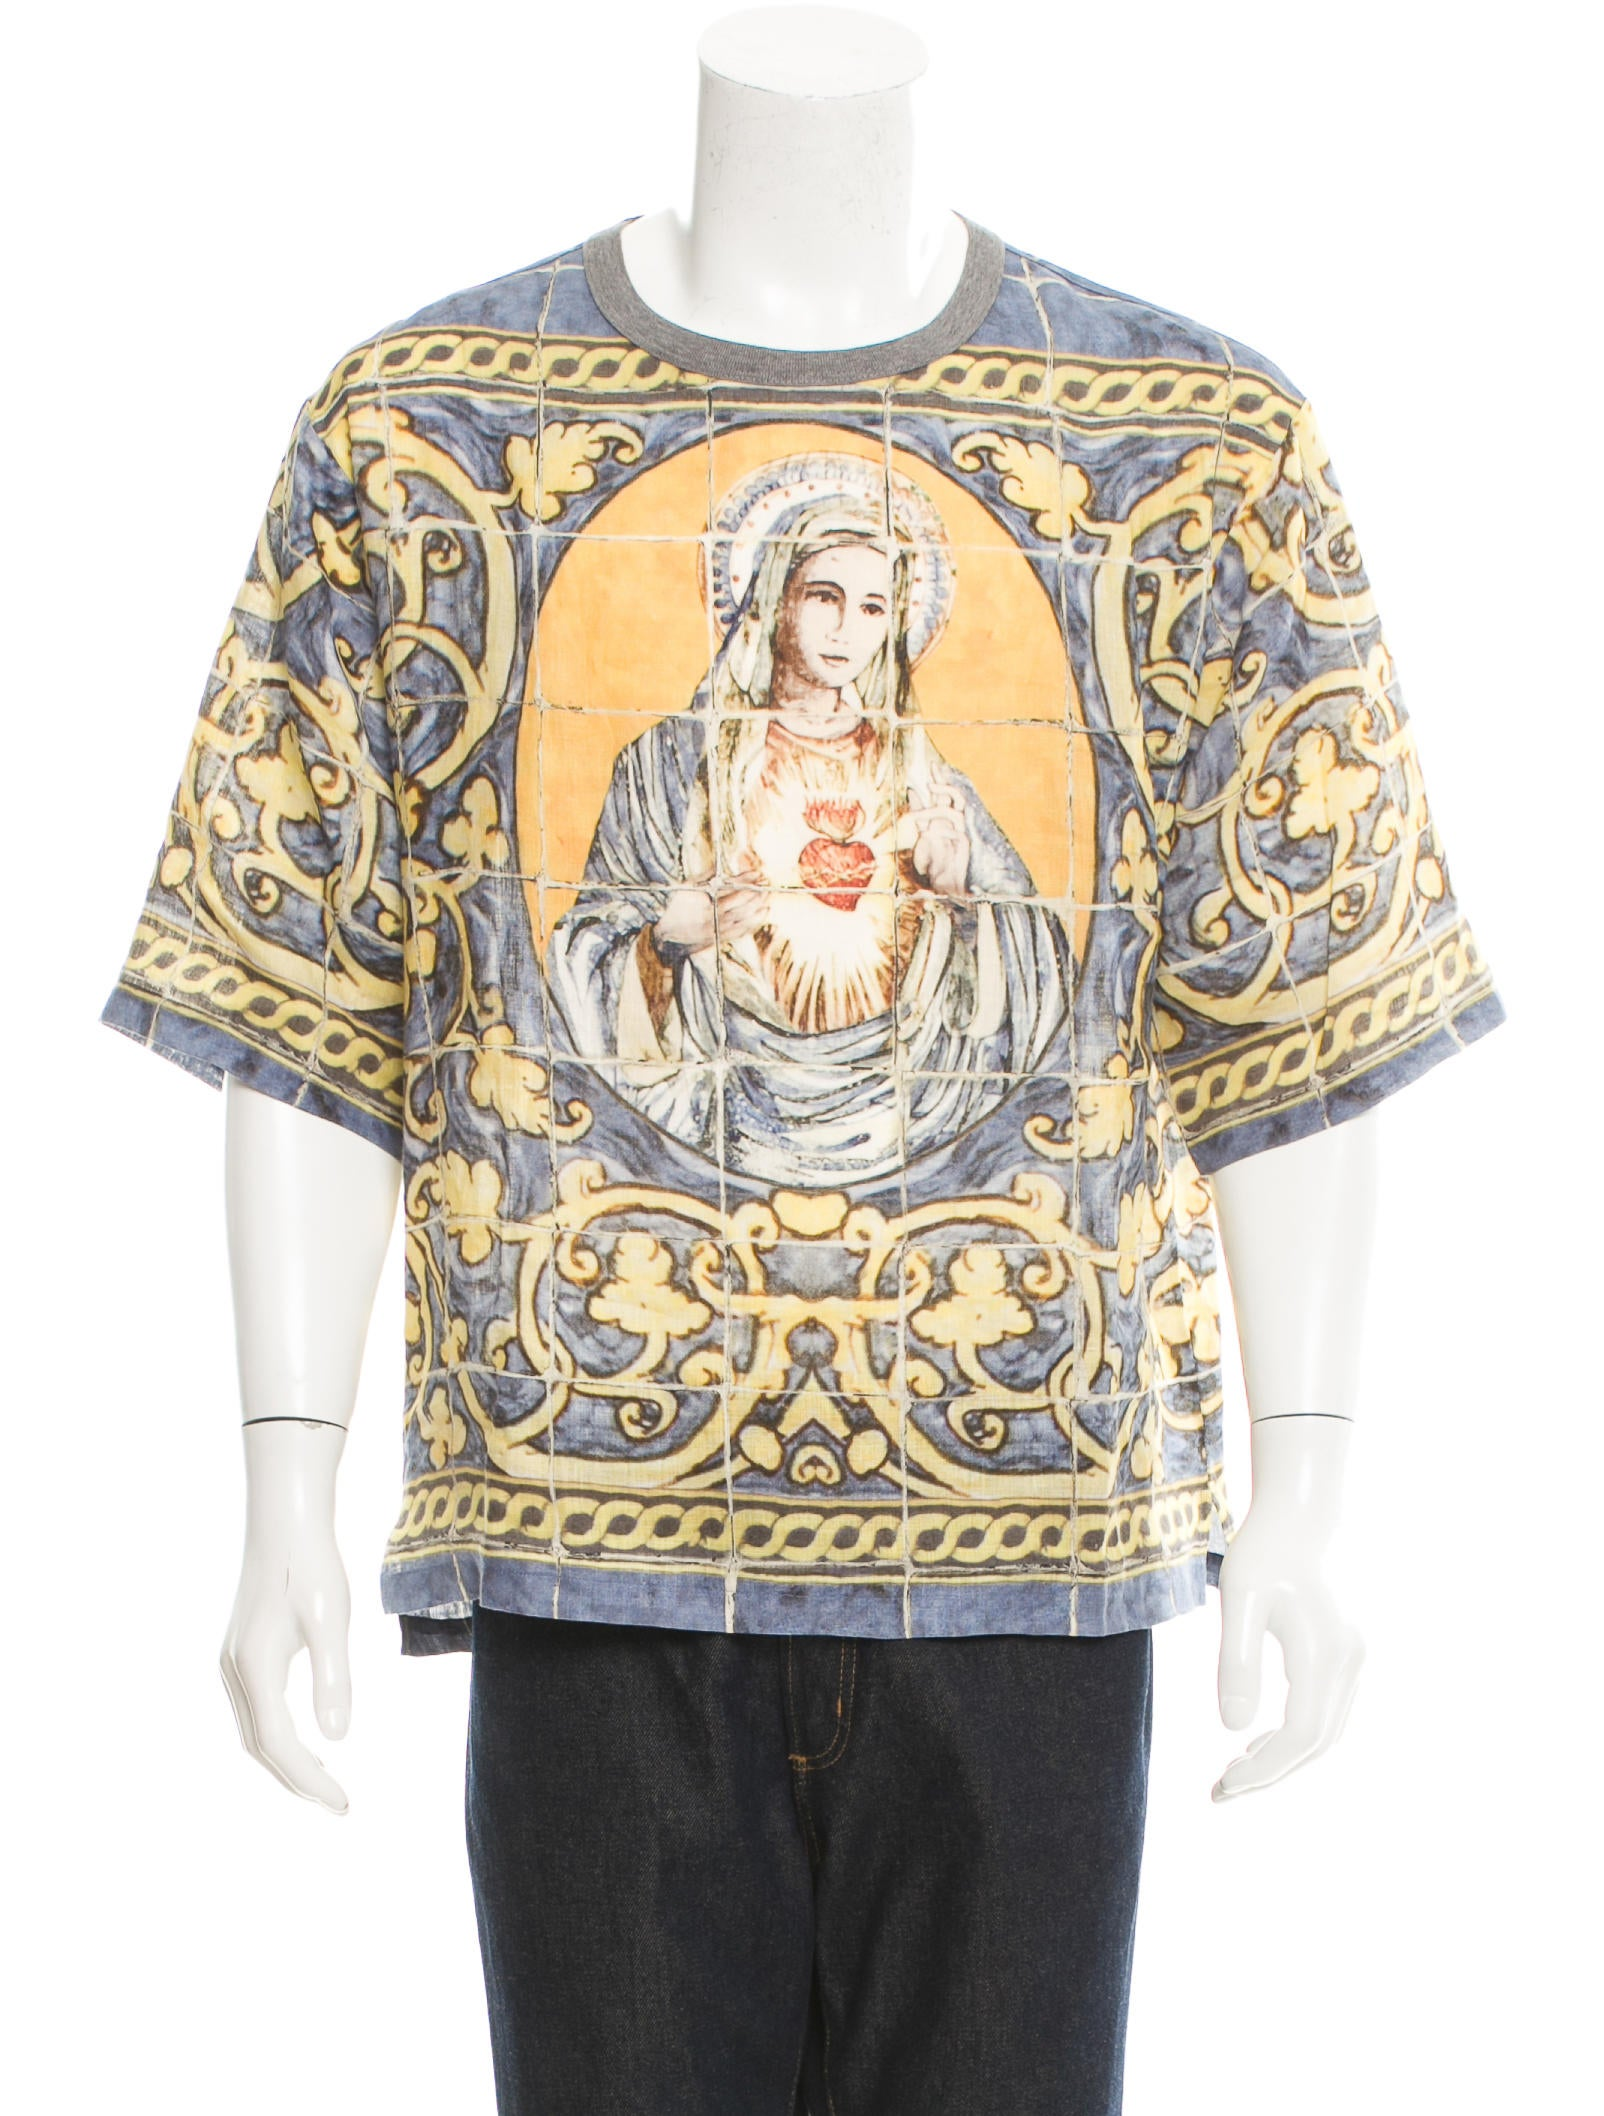 Dolce gabbana linen printed t shirt clothing for Dolce and gabbana printed t shirts